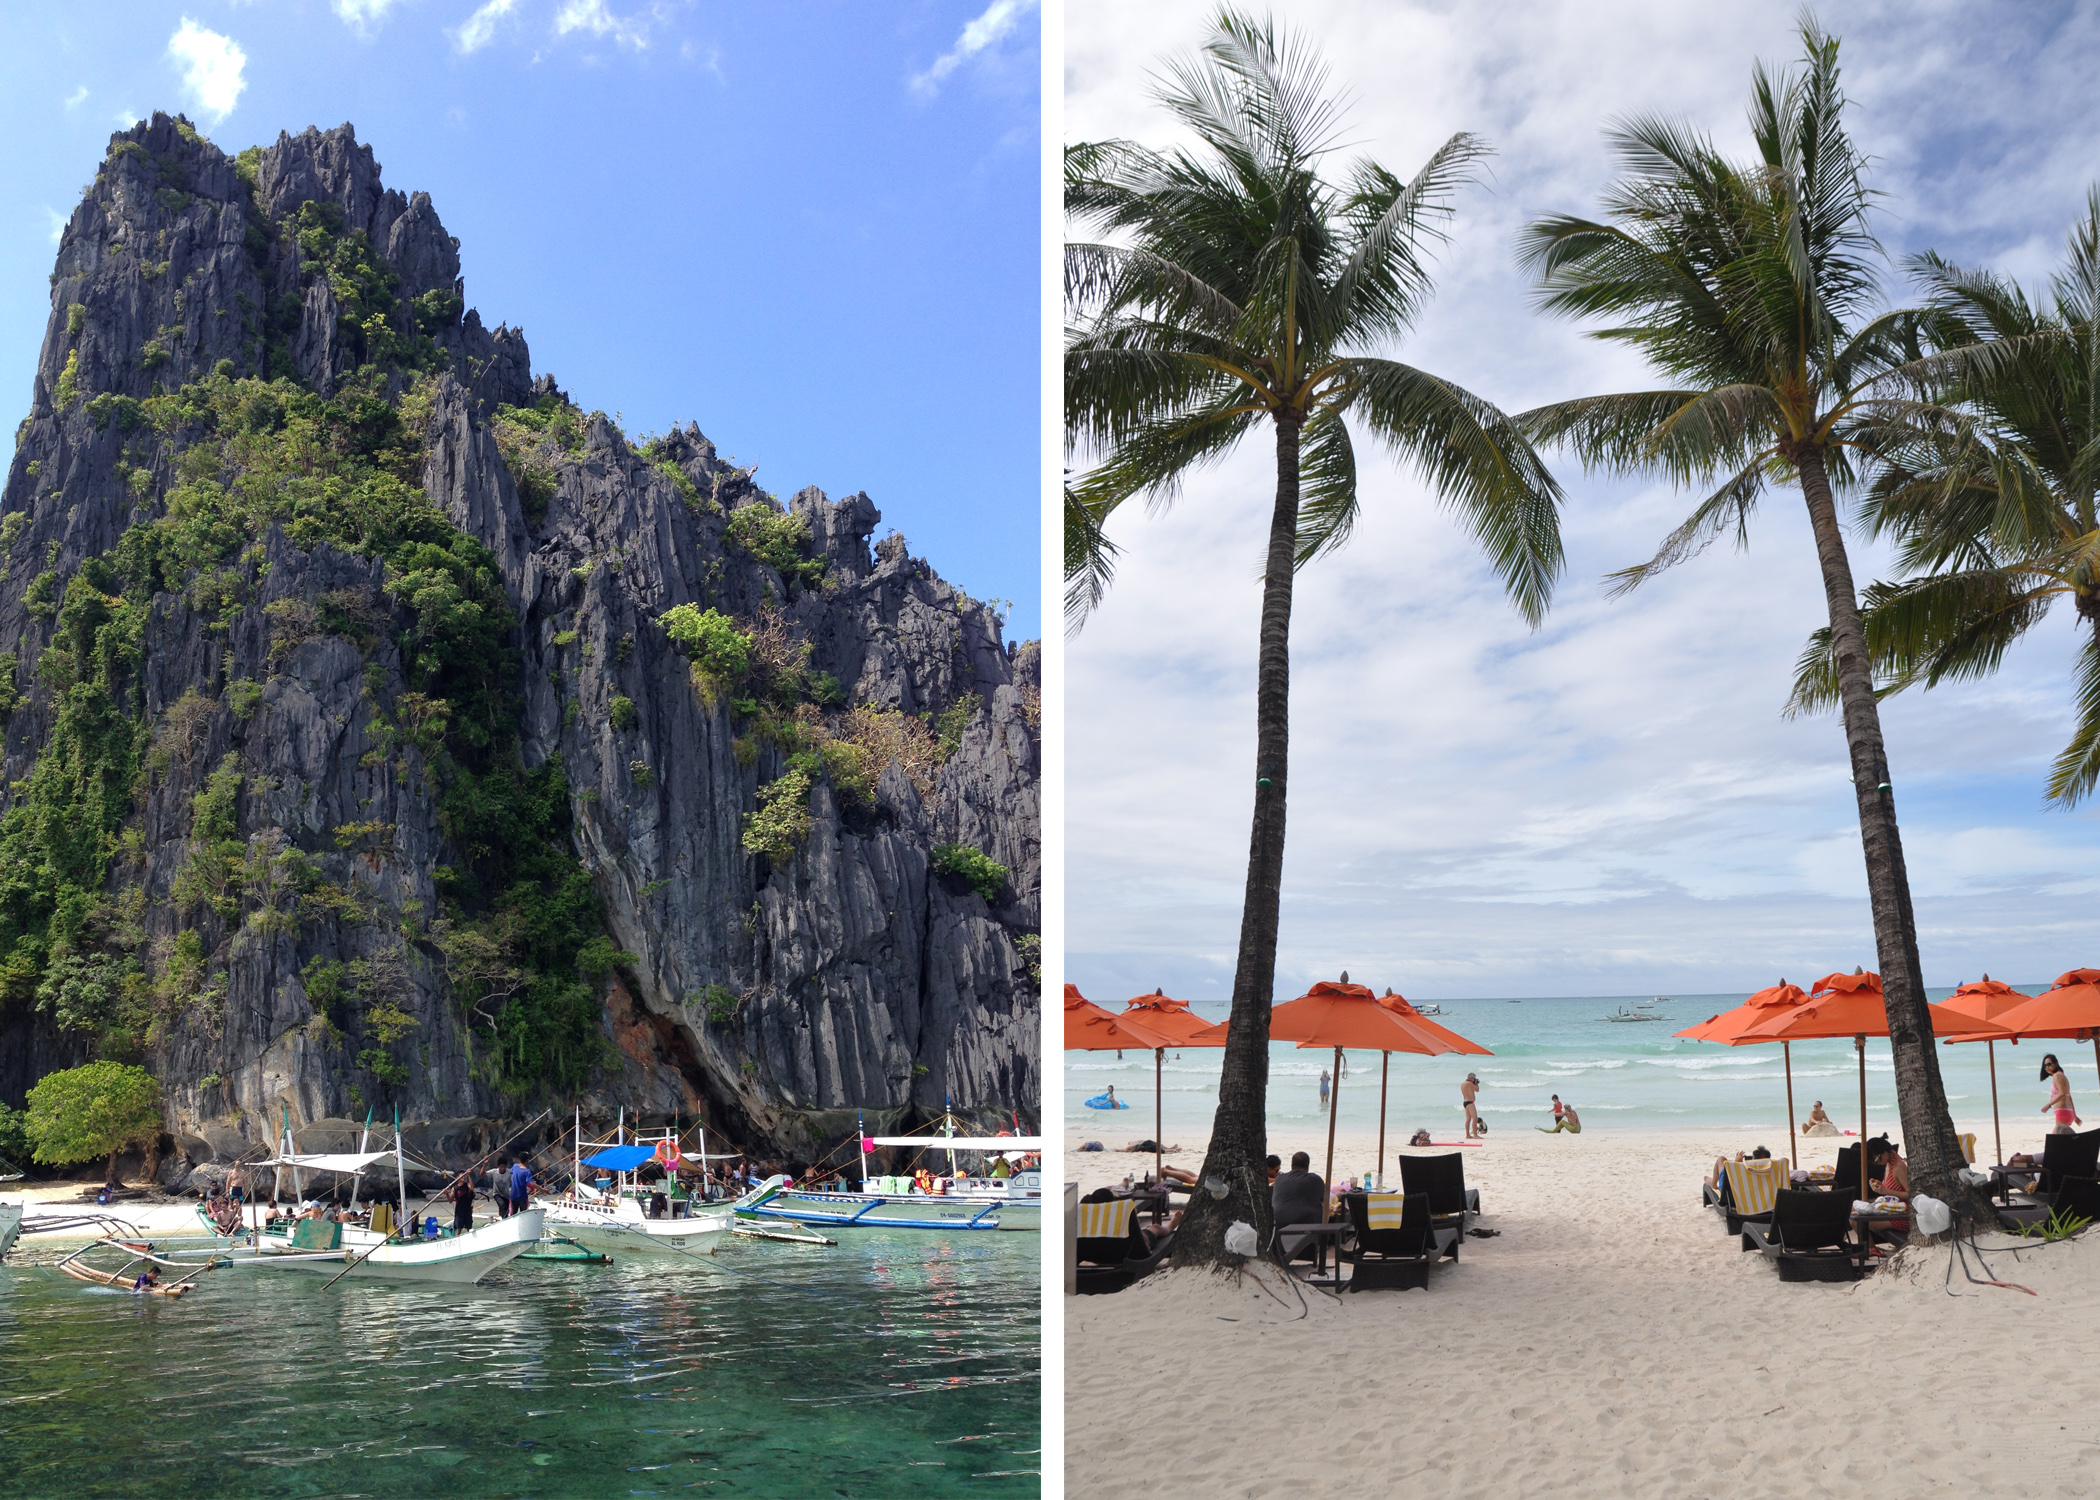 Philippines Beach and ocean